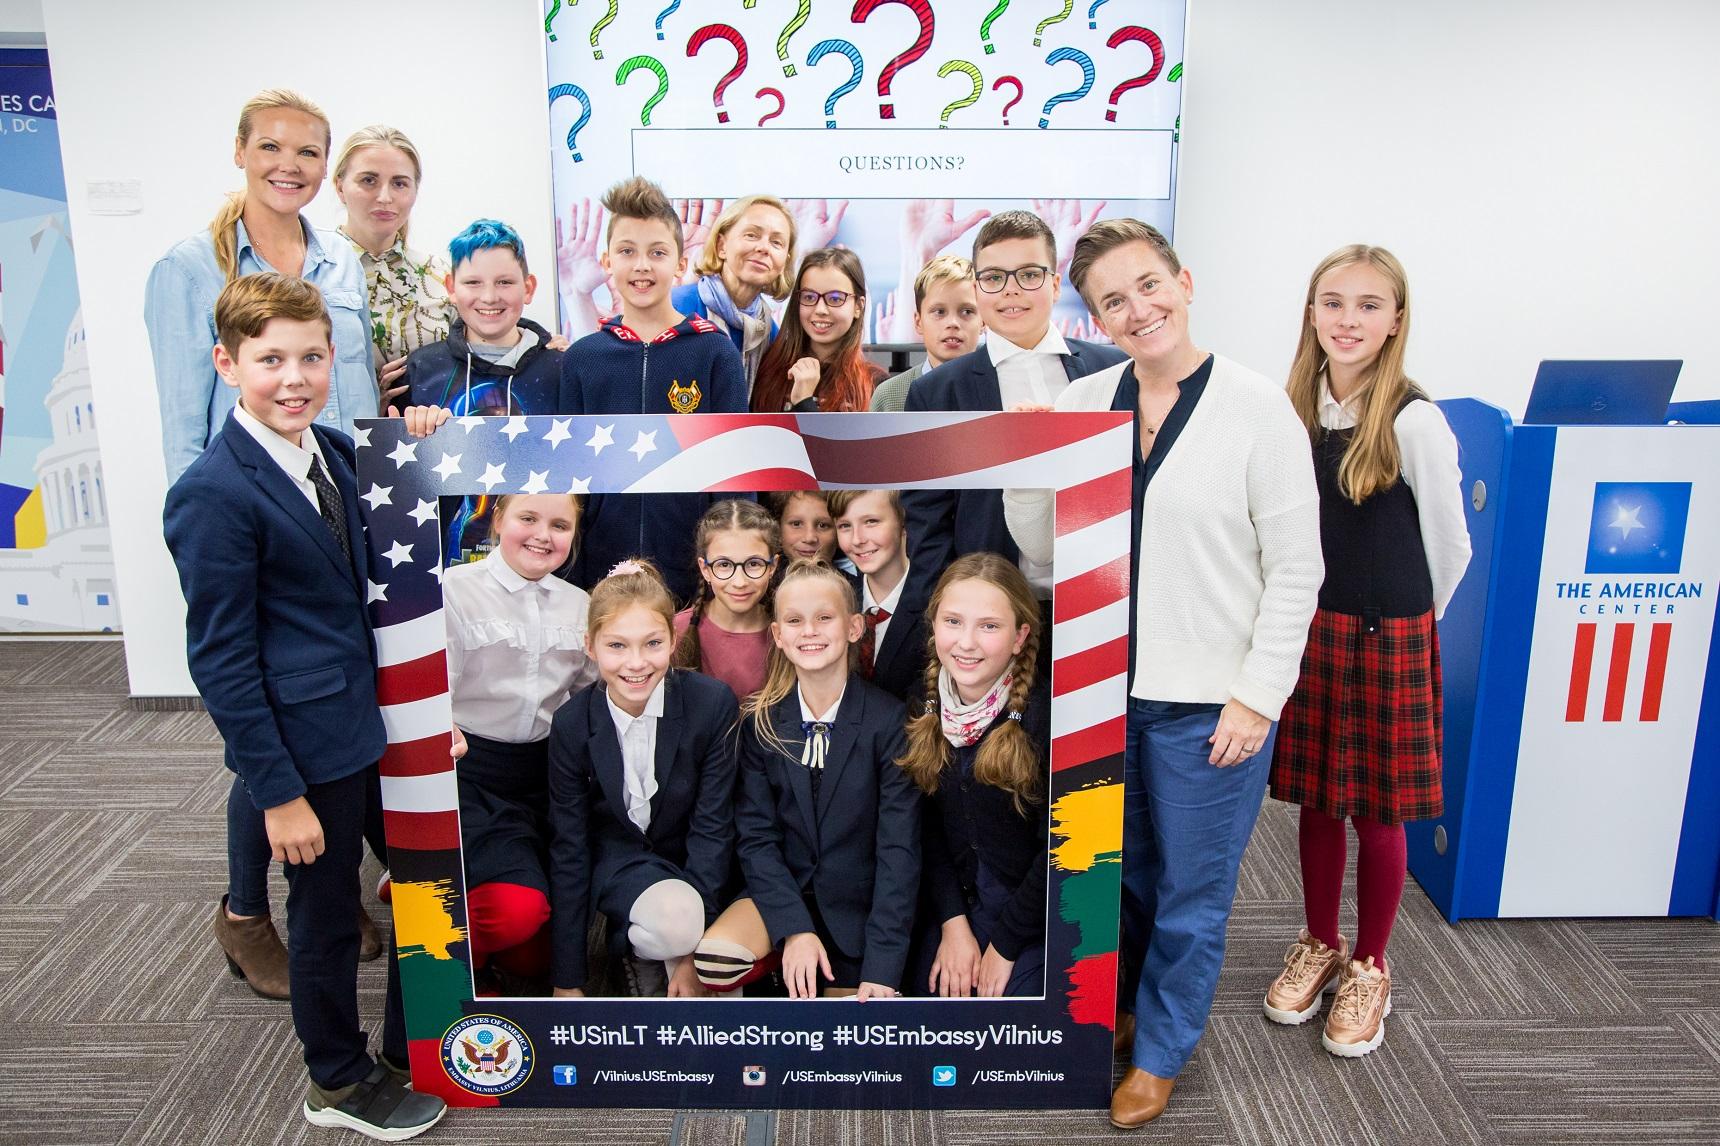 2019 09 26 - Meghan's Presentation @ American Center-13